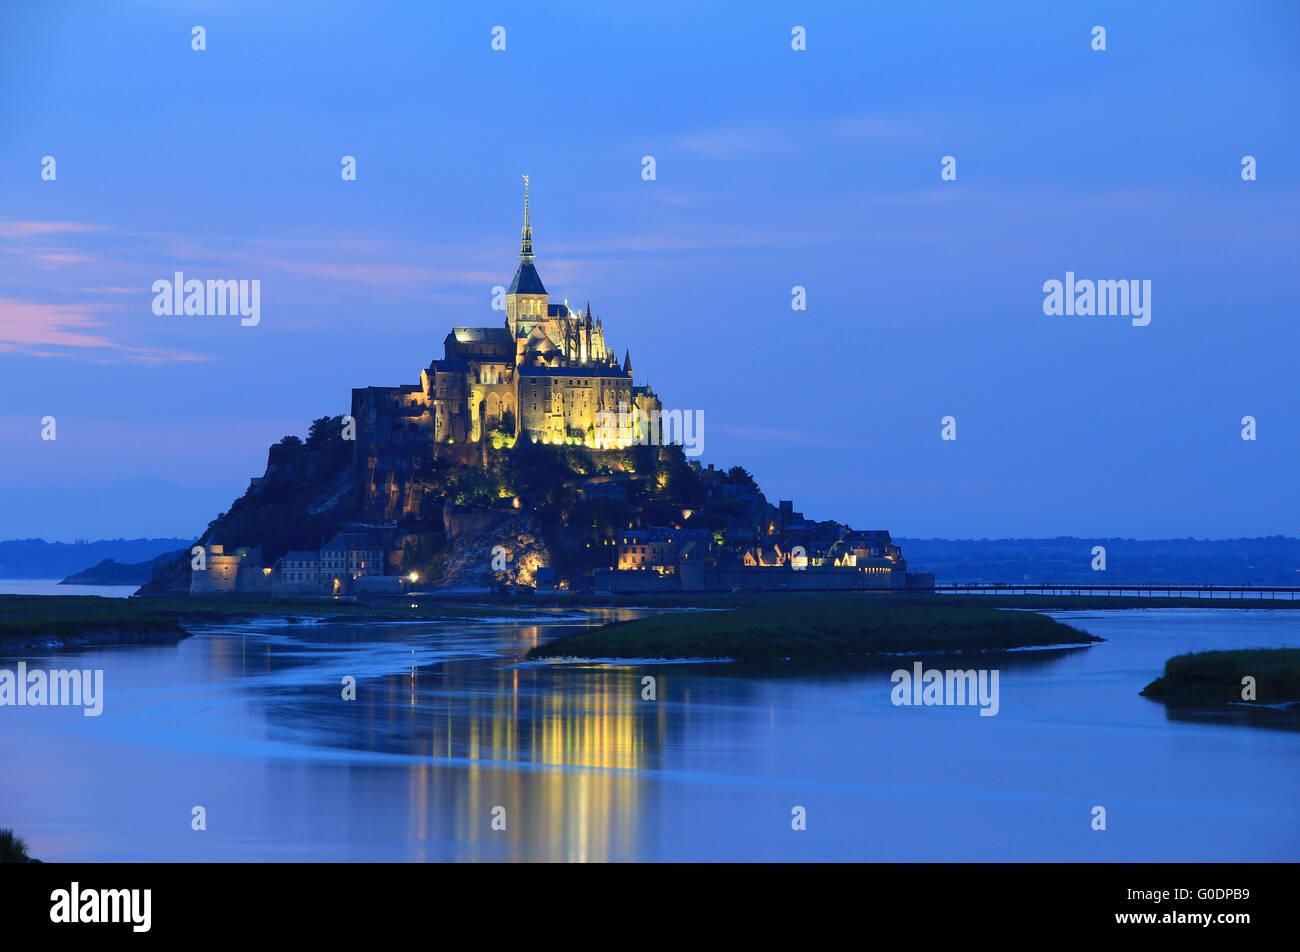 The Mont-Saint-Michel at night flood - Stock Image